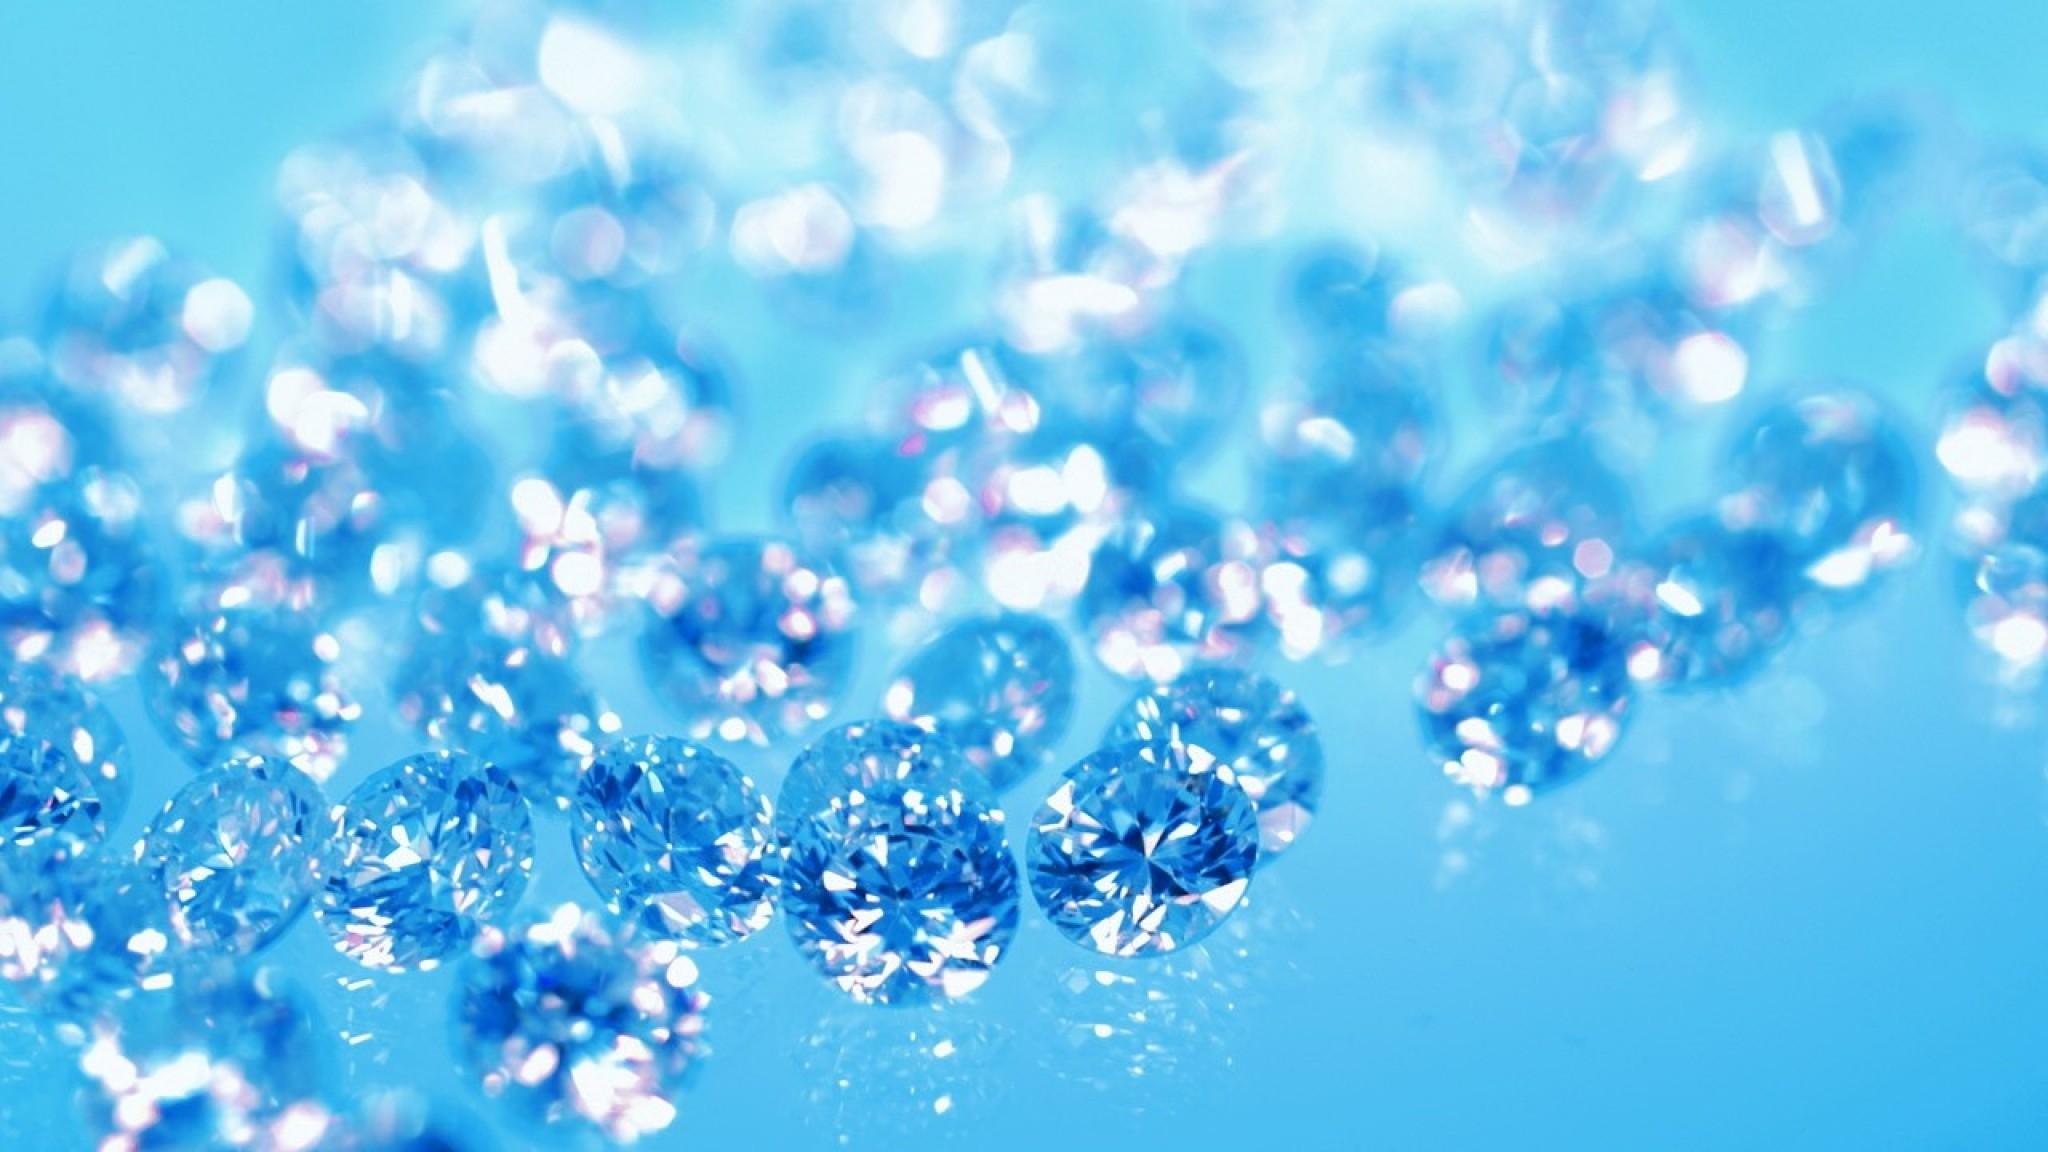 Res: 2048x1152, Blue Diamonds Wallpaper Hd On Wallpaper Hd